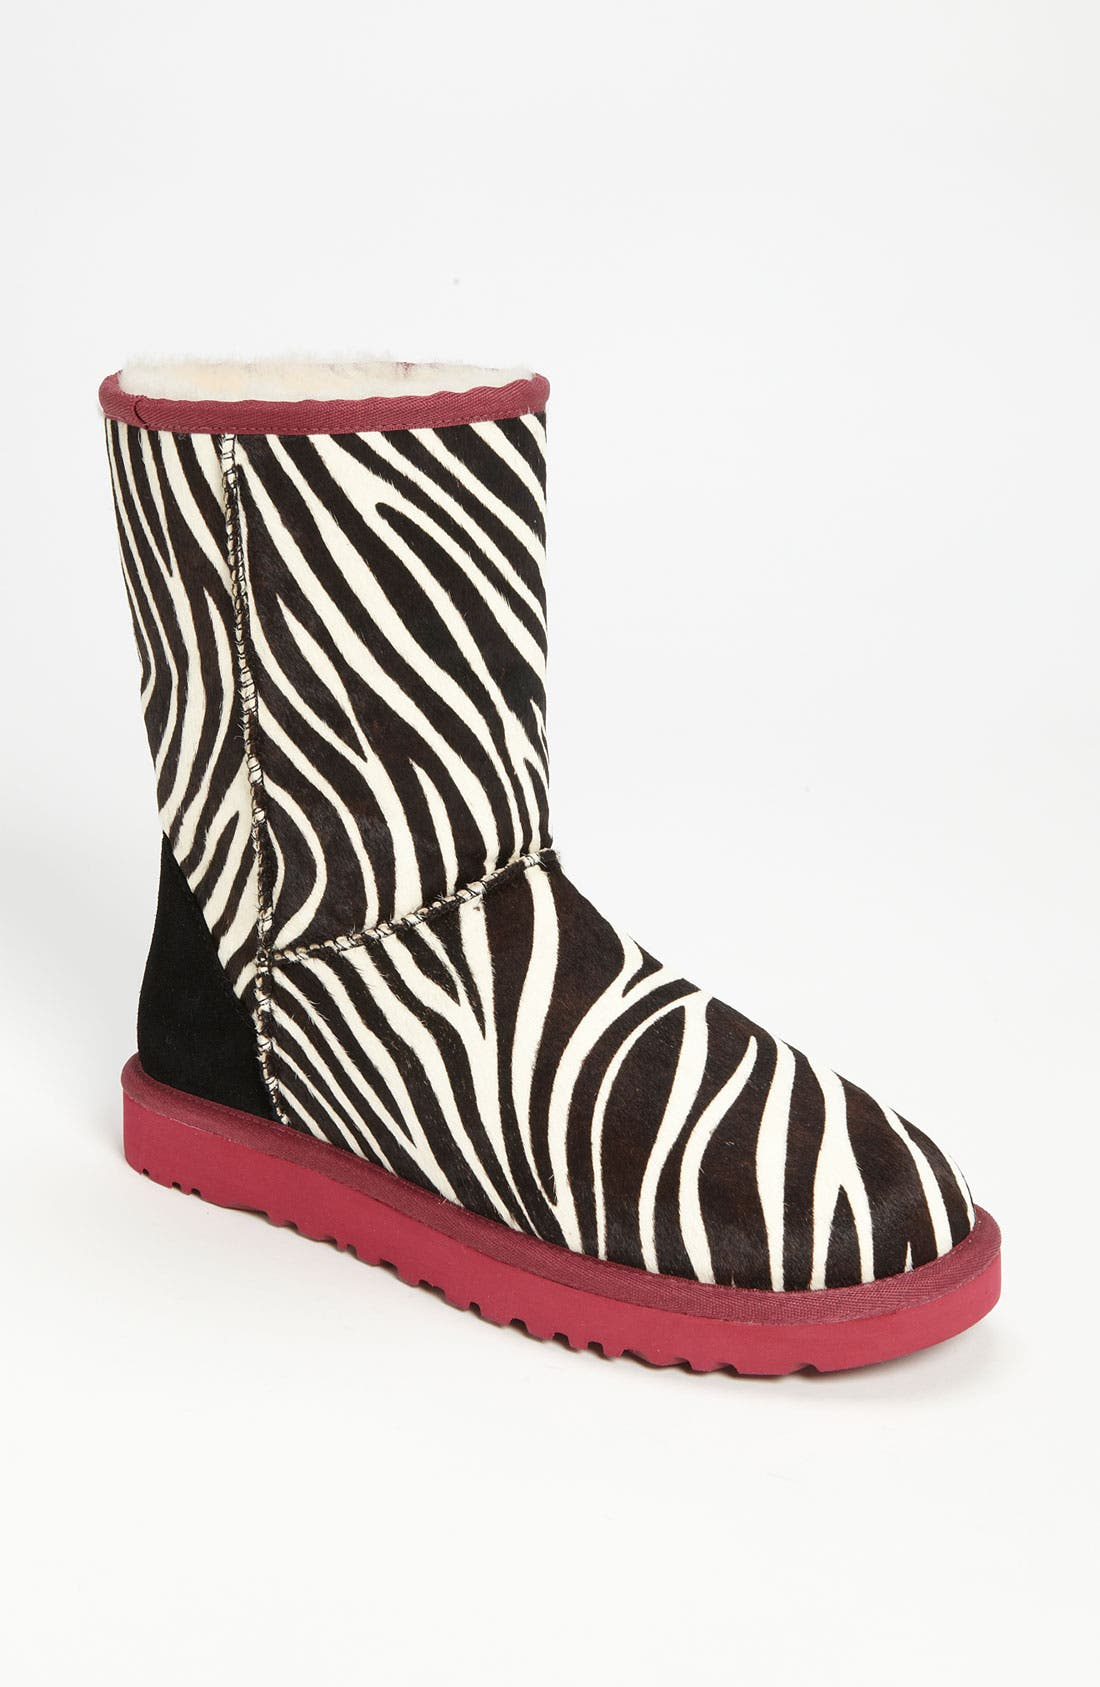 Main Image - UGG® Australia 'Classic Short' Boot (Women) (Exclusive Color)